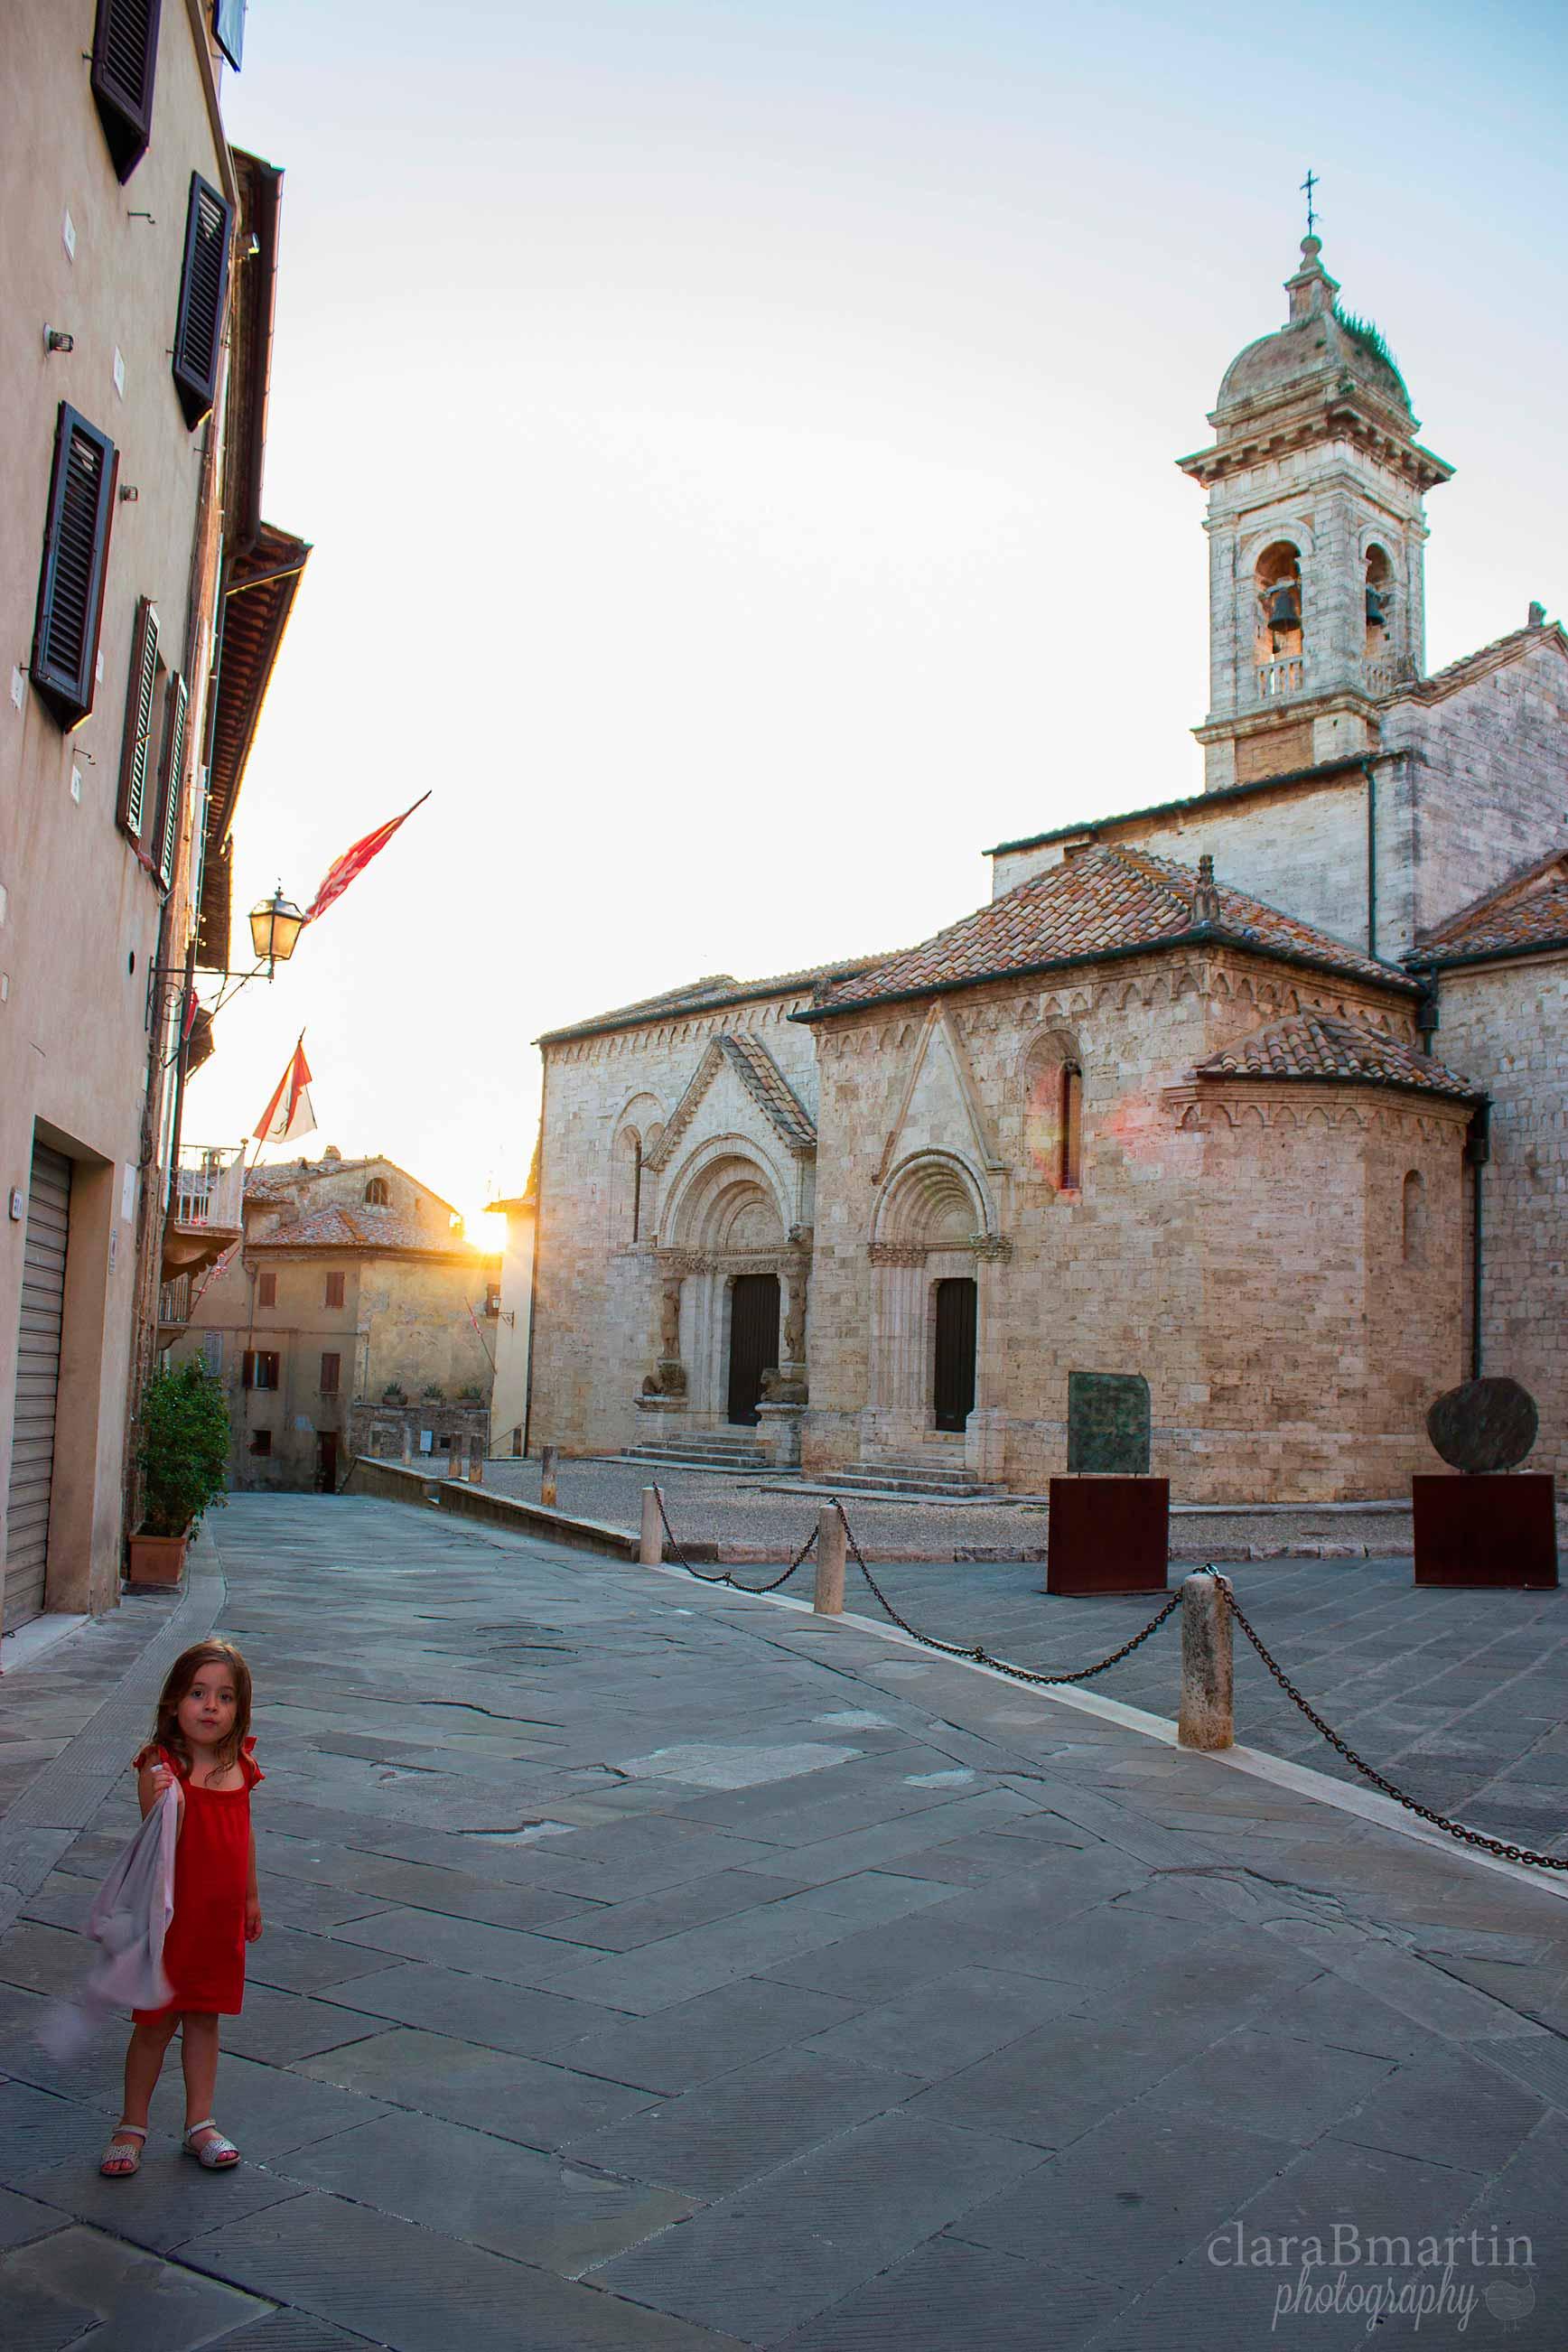 Toscana_claraBmartin13